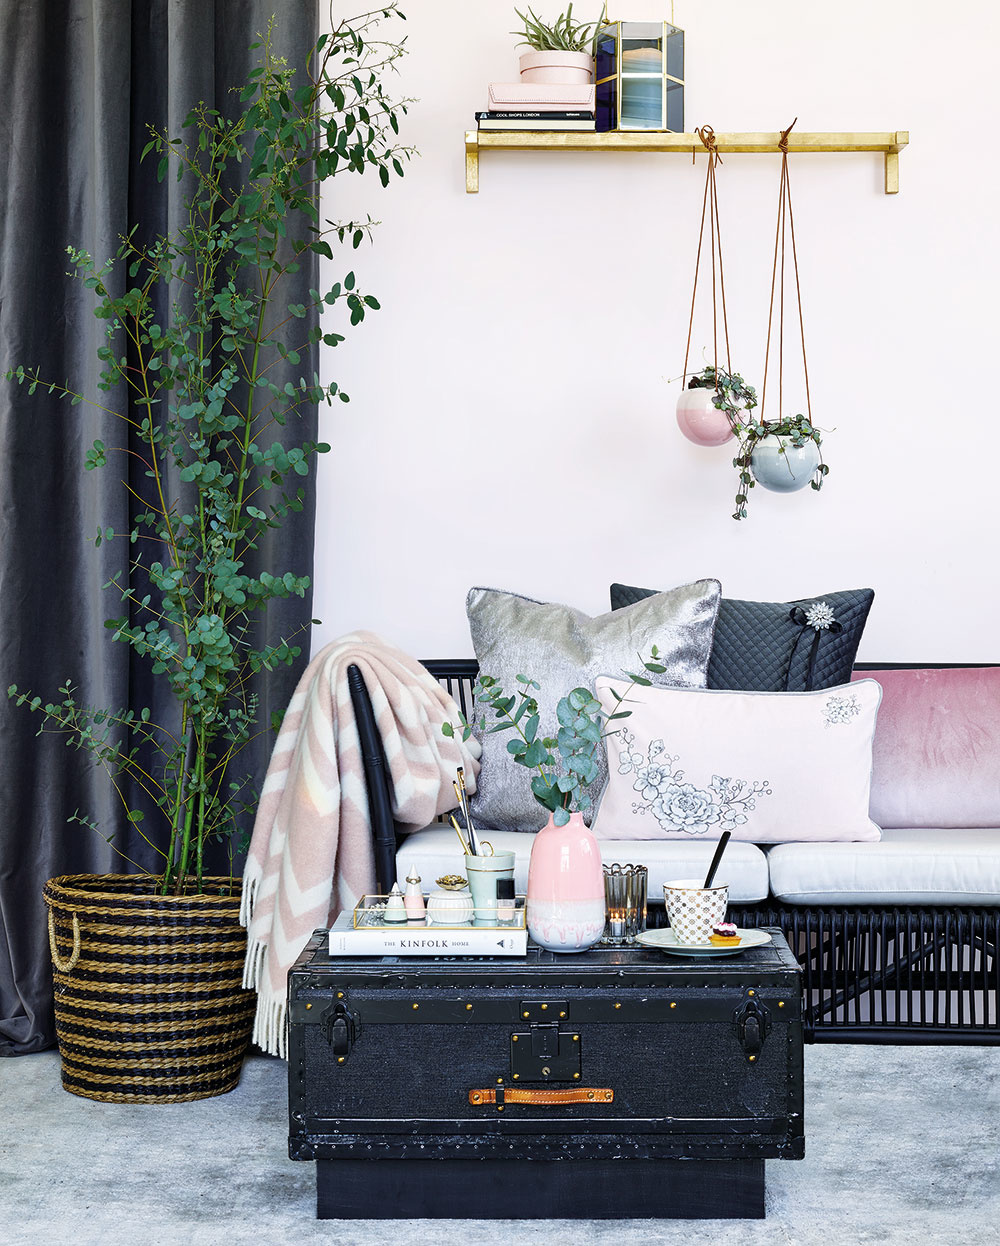 Obývačka či spálňa? Vneste do interiéru zamatovú noblesu